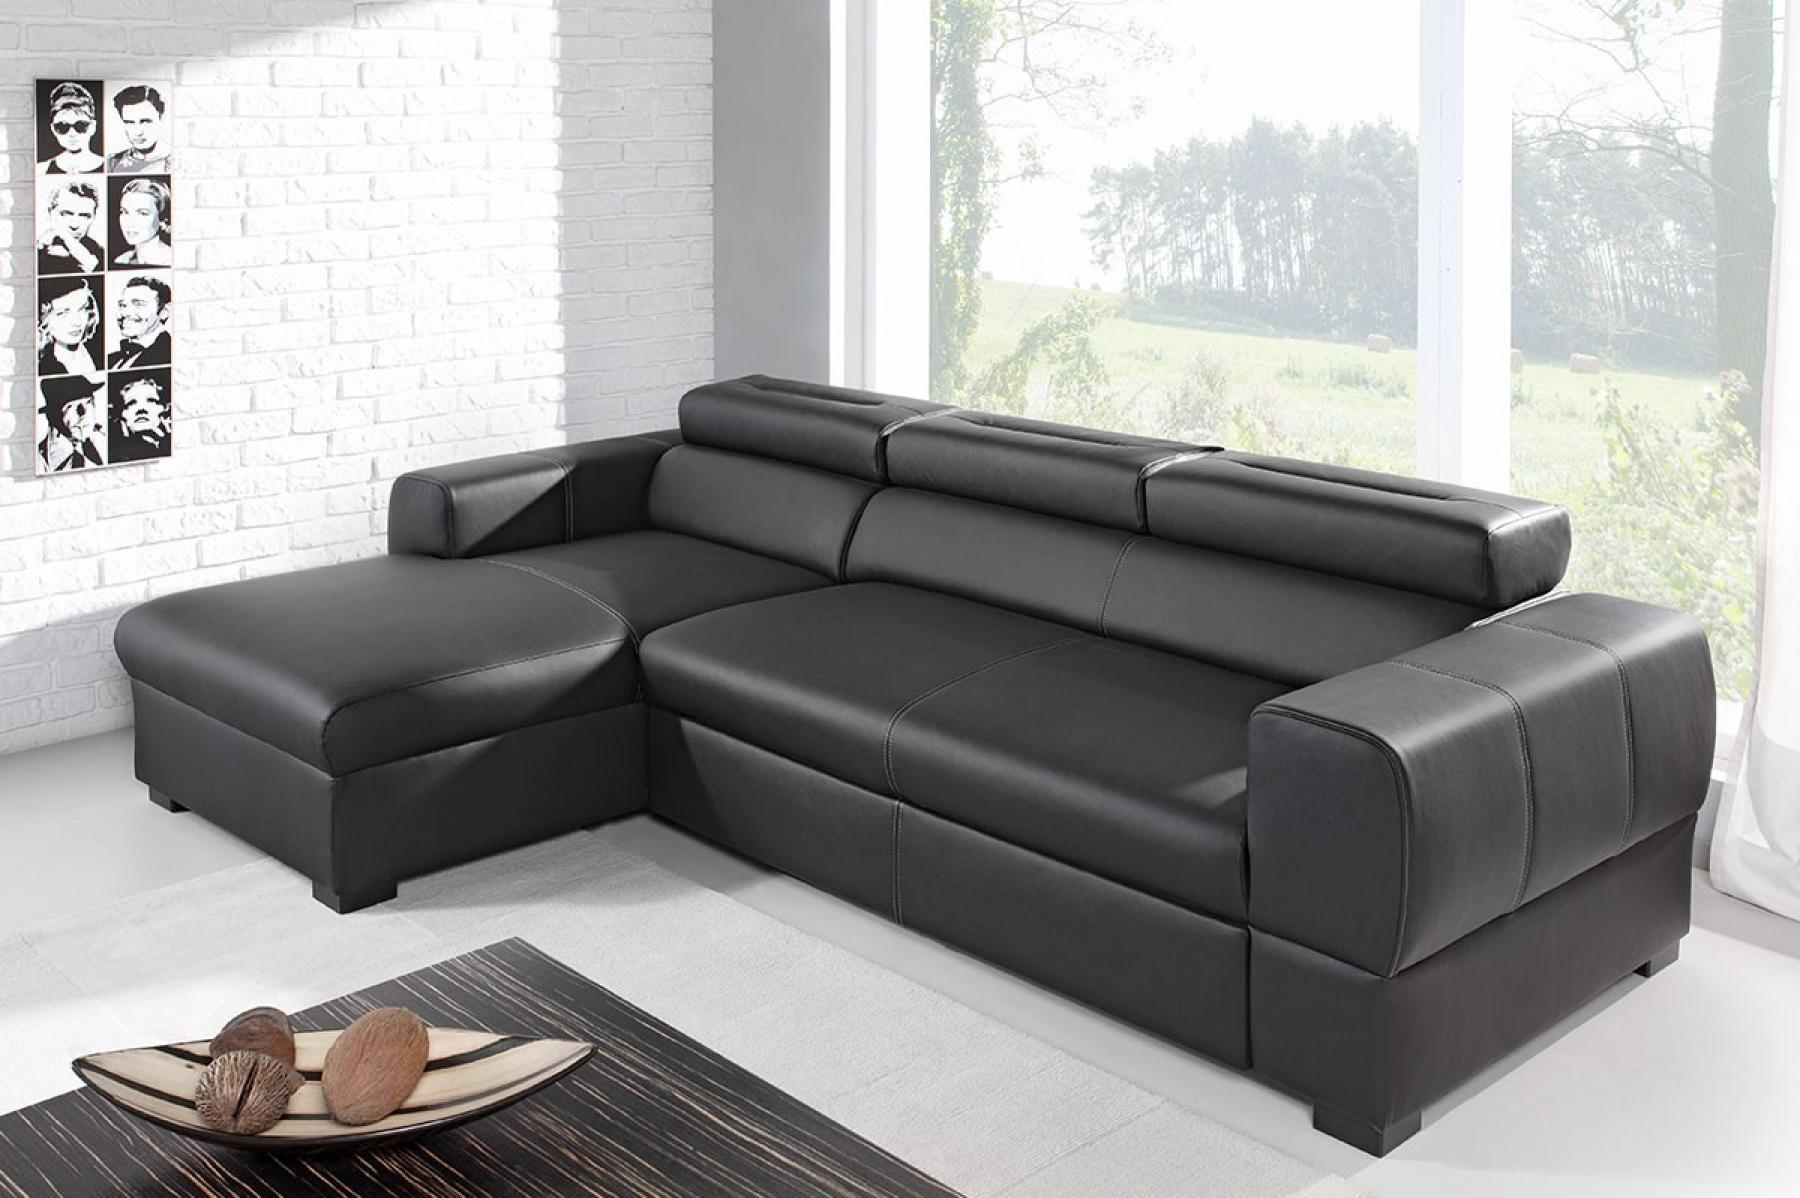 photos canap d 39 angle cuir noir convertible. Black Bedroom Furniture Sets. Home Design Ideas